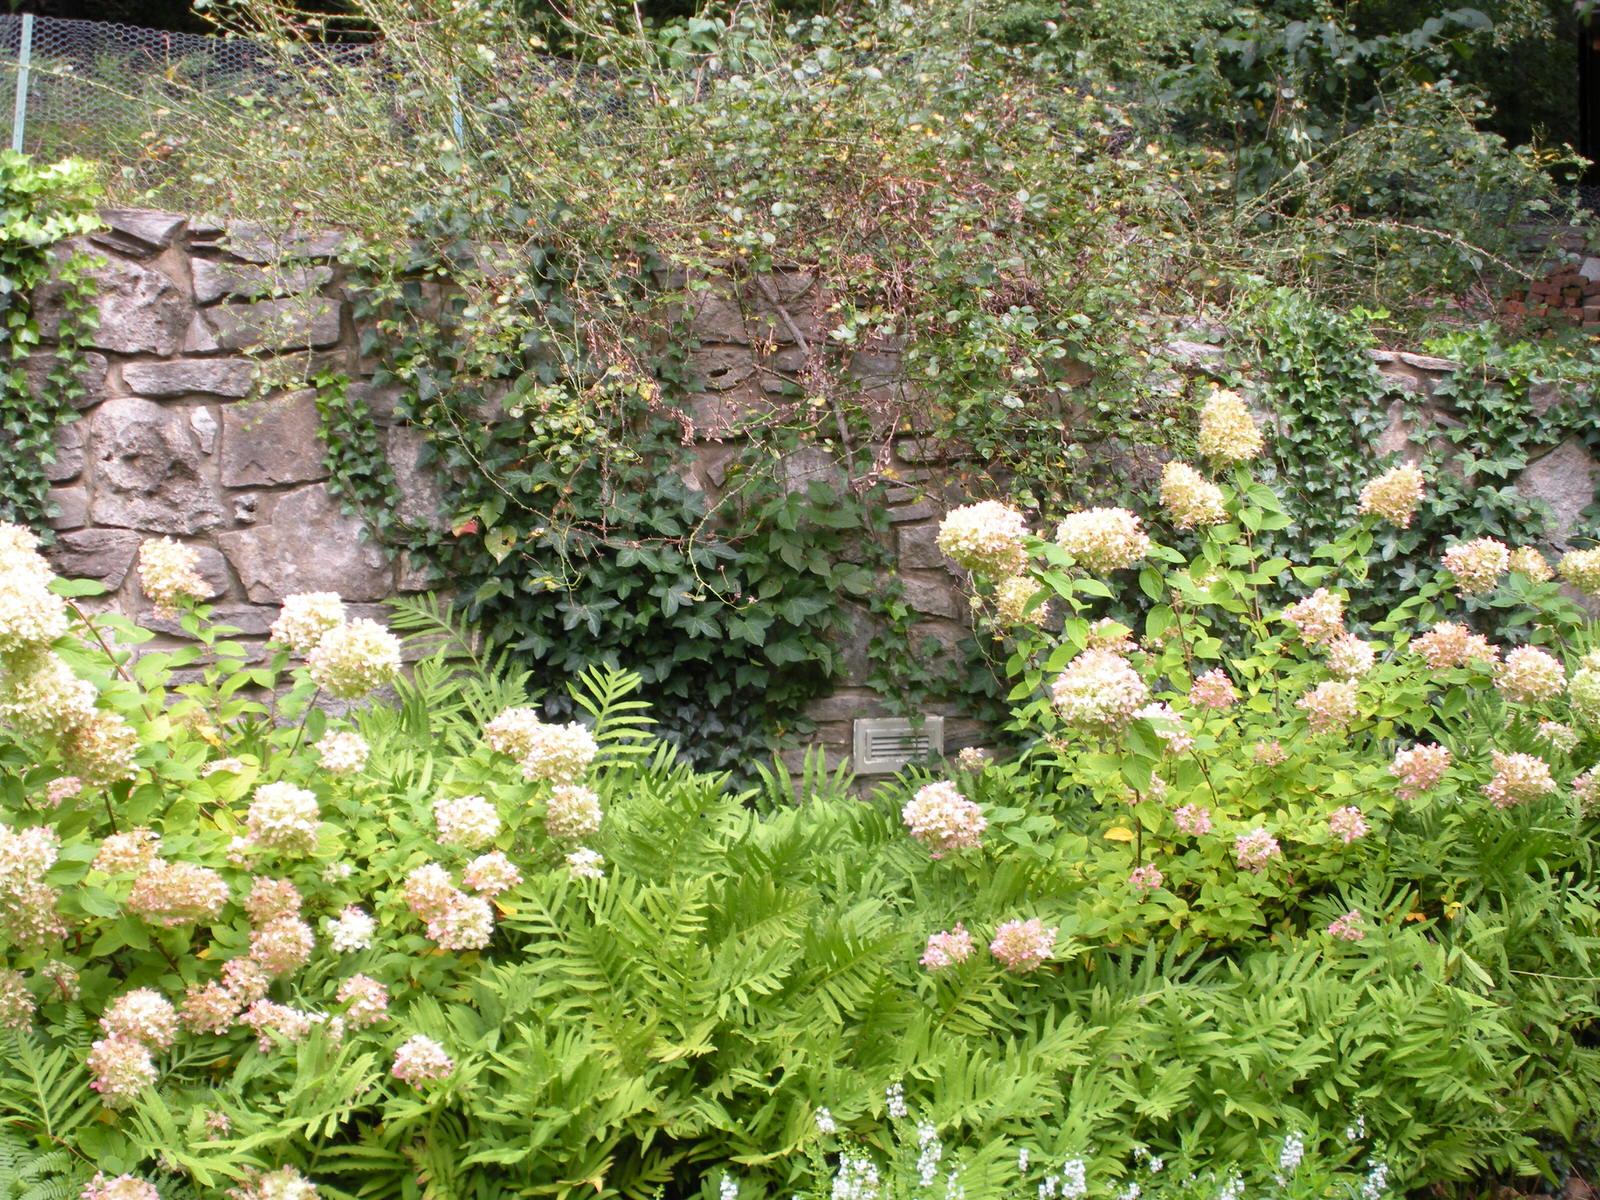 Justin Stelter Landscape Gardening - Country Garden - Justin Stelter Landscape Gardening - Country Garden2887105134_cab0864e30_o.jpg